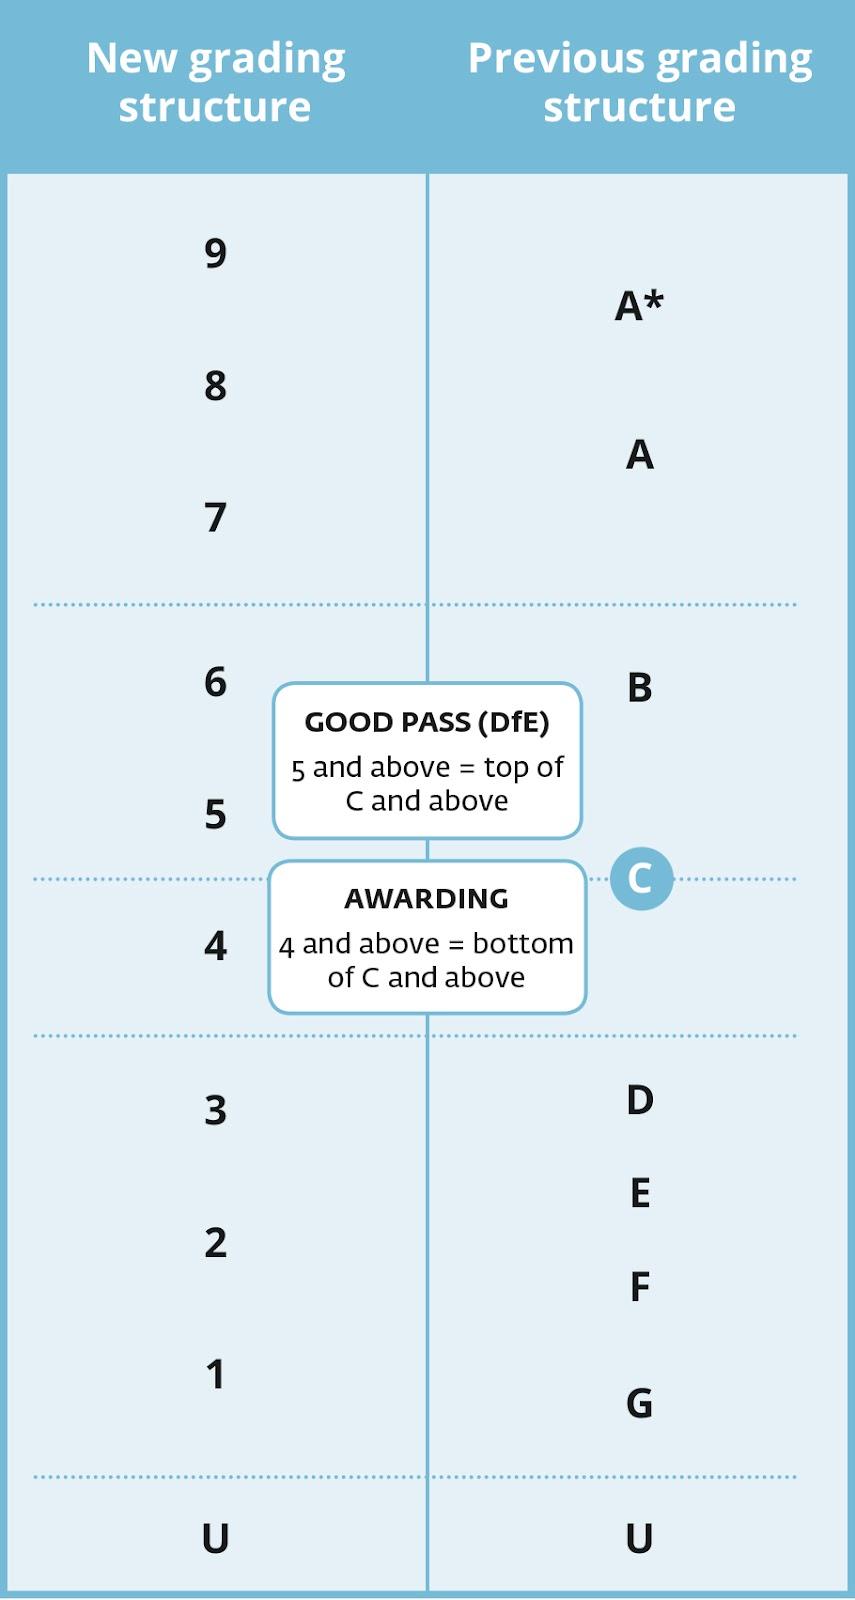 STC_GCSE-grading-infographic.jpg